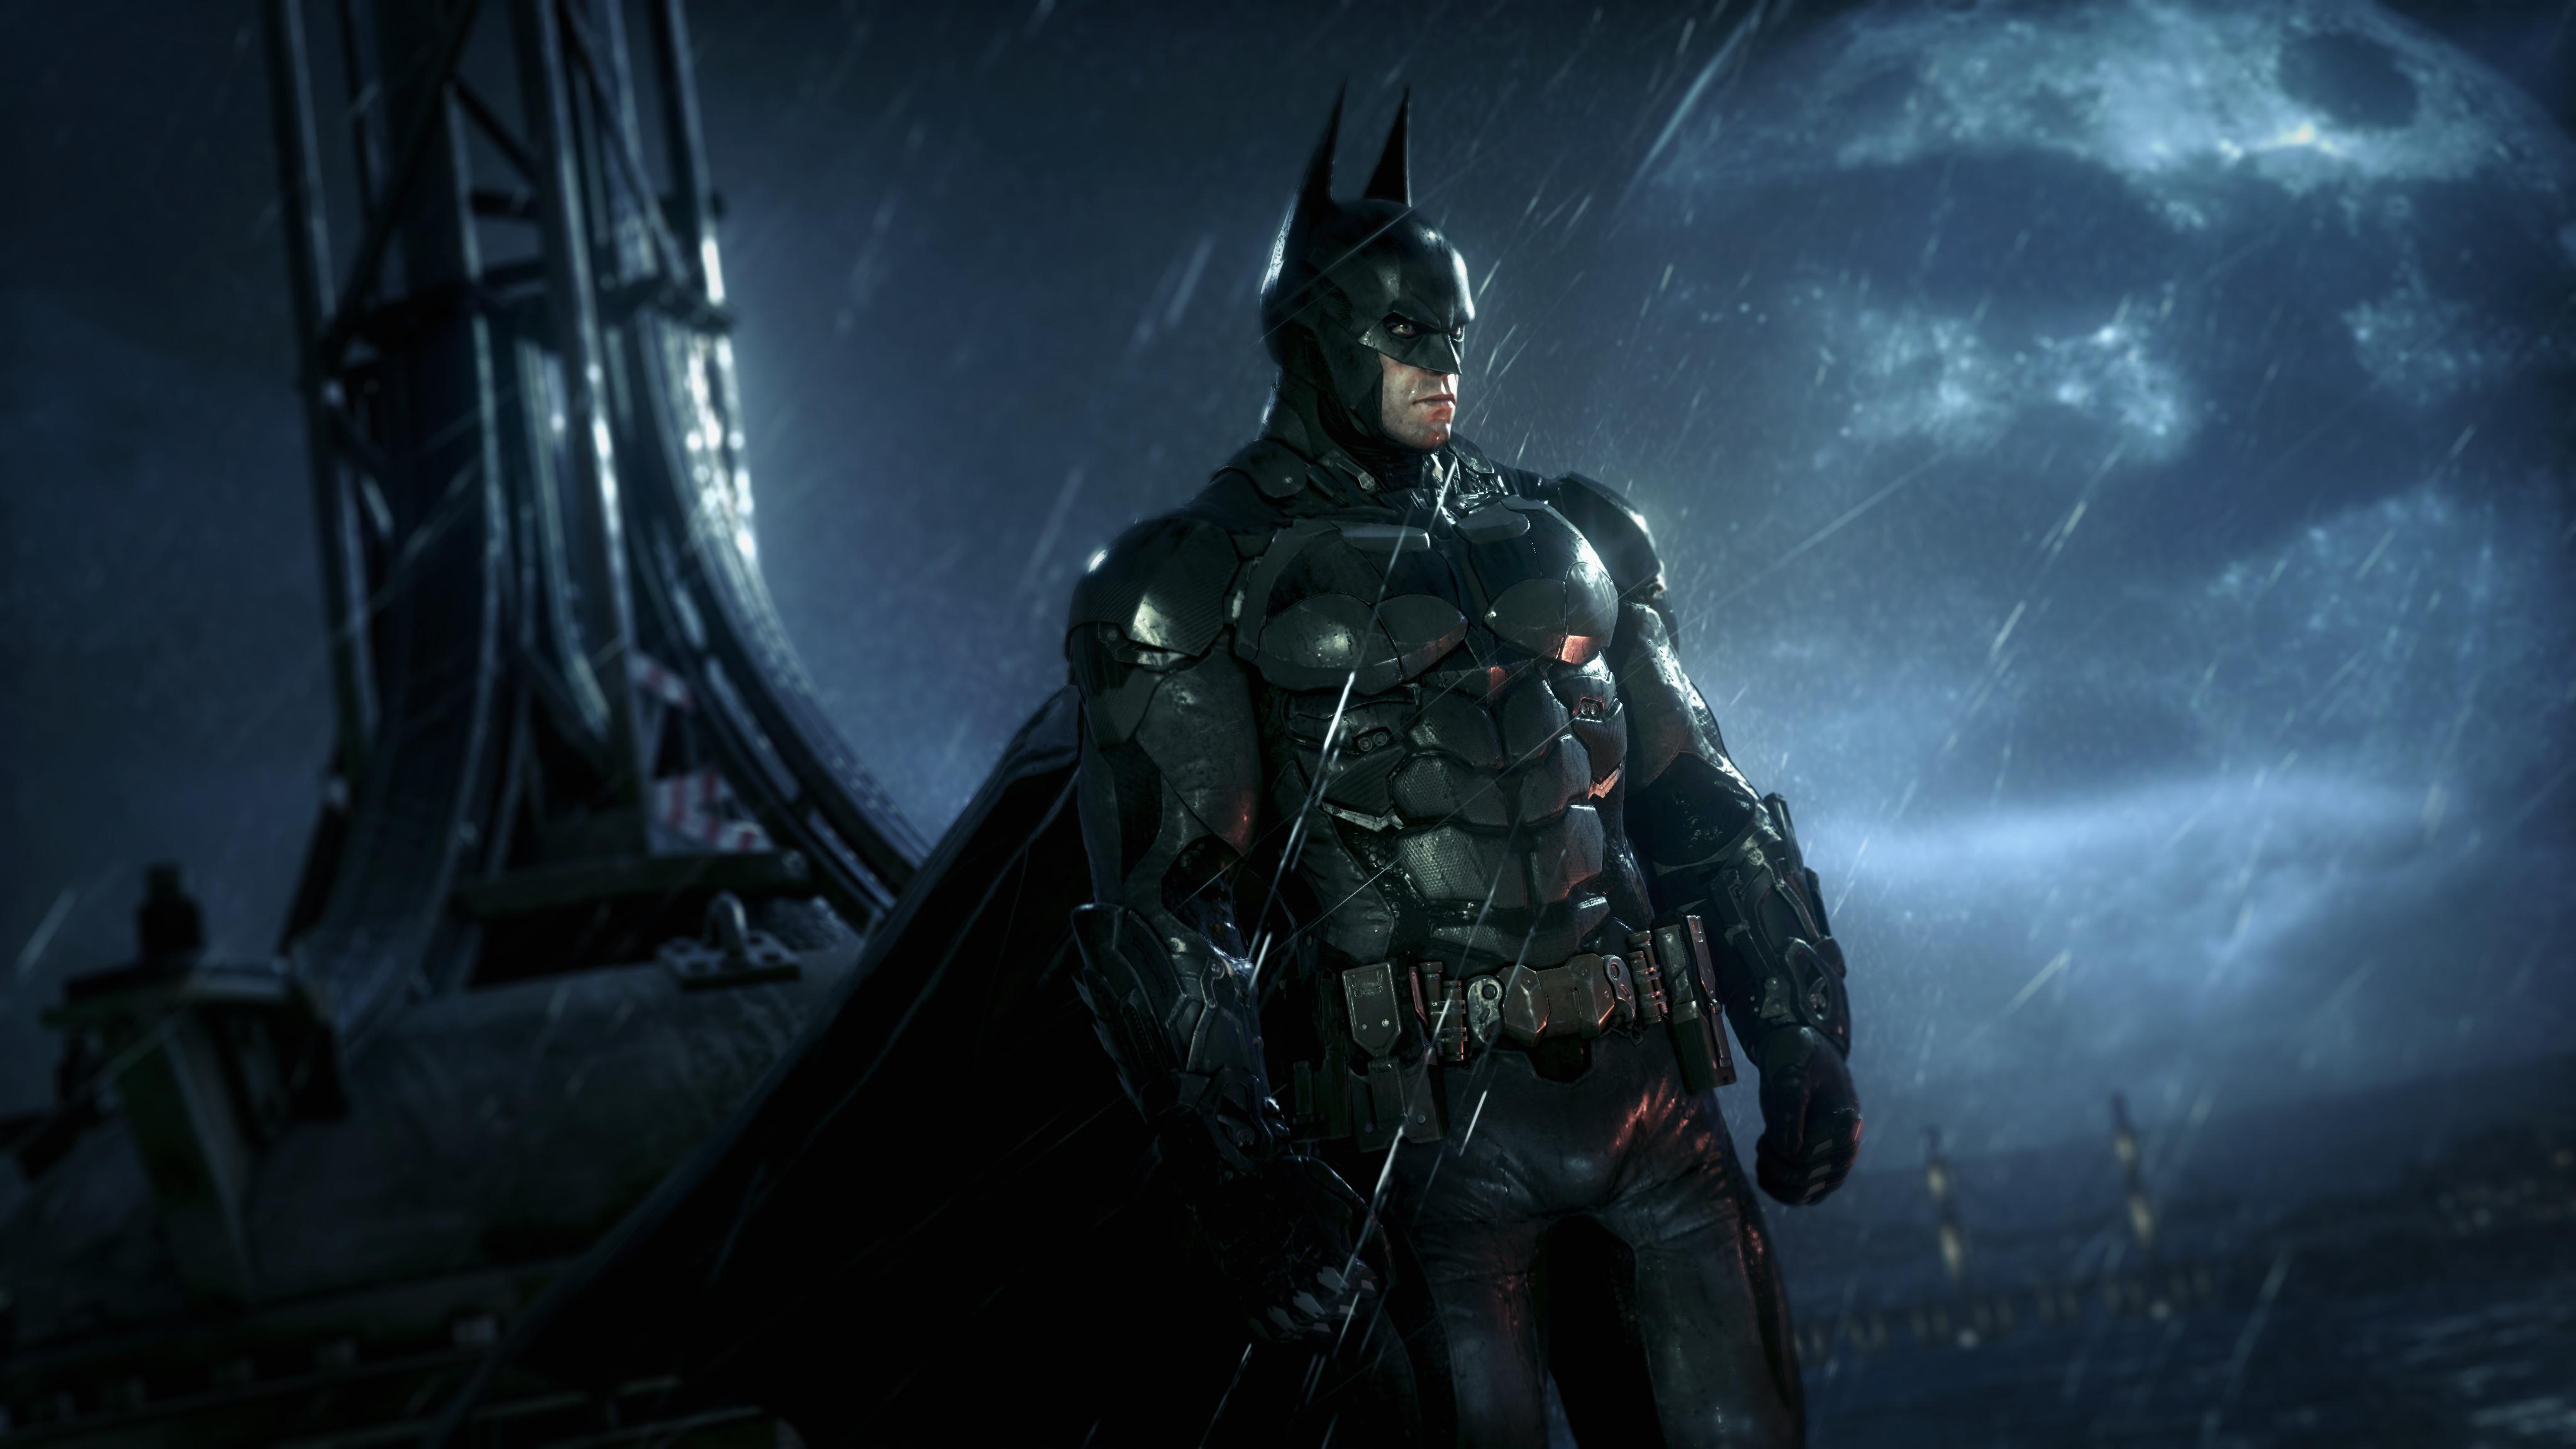 0a04dbb94e5610cfc90d6d135753012dbbfd23a8 Batman: Arkham Knight'ın PlayStation 4 üzerindeki boyutu arttı